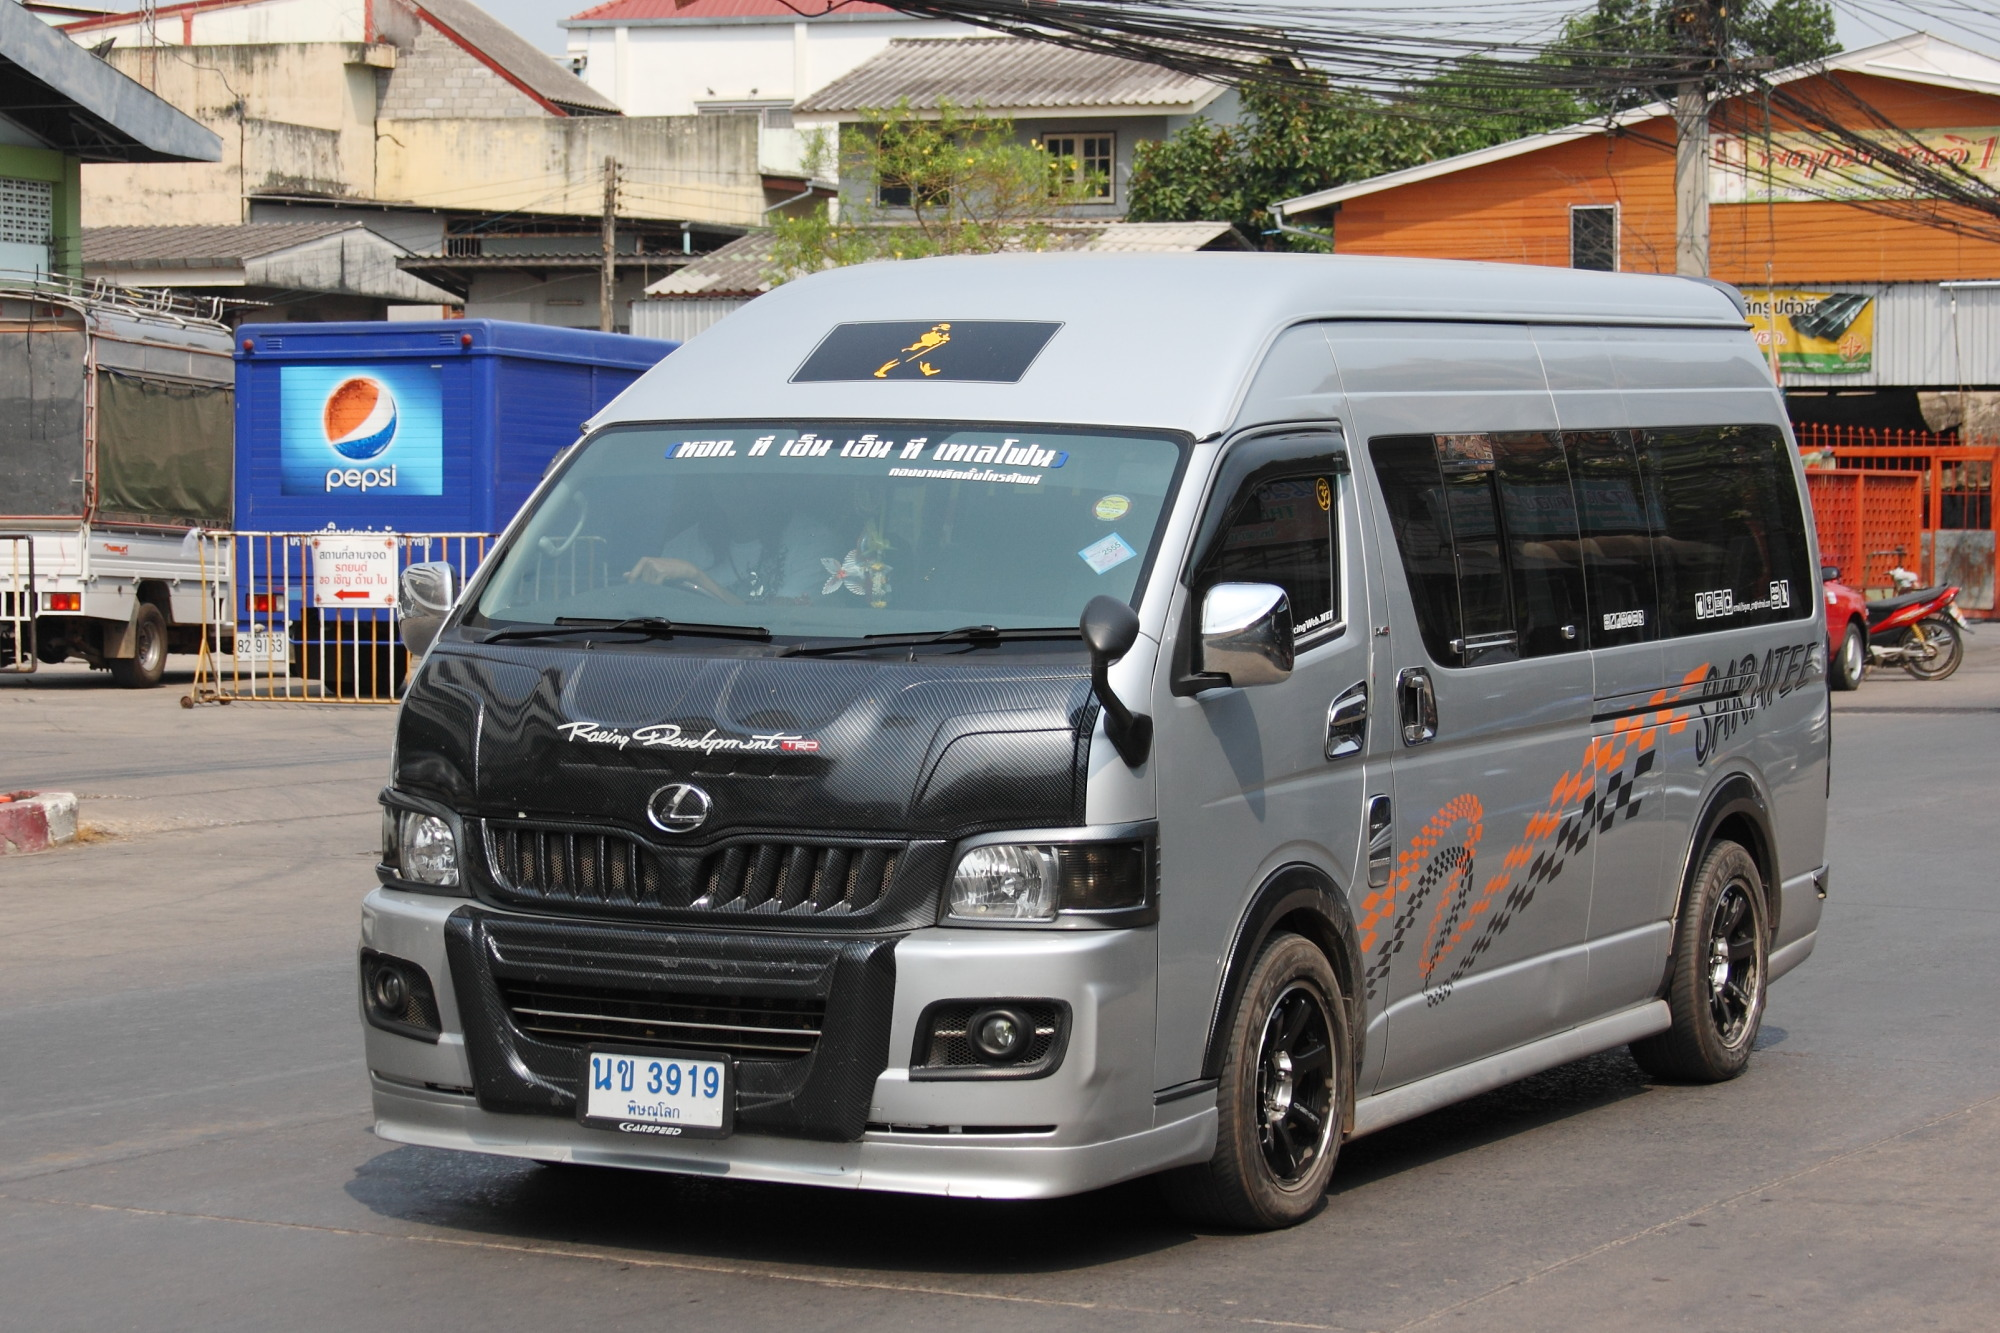 File:Toyota Commuter in Phitsanulok.JPG - Wikimedia Commons